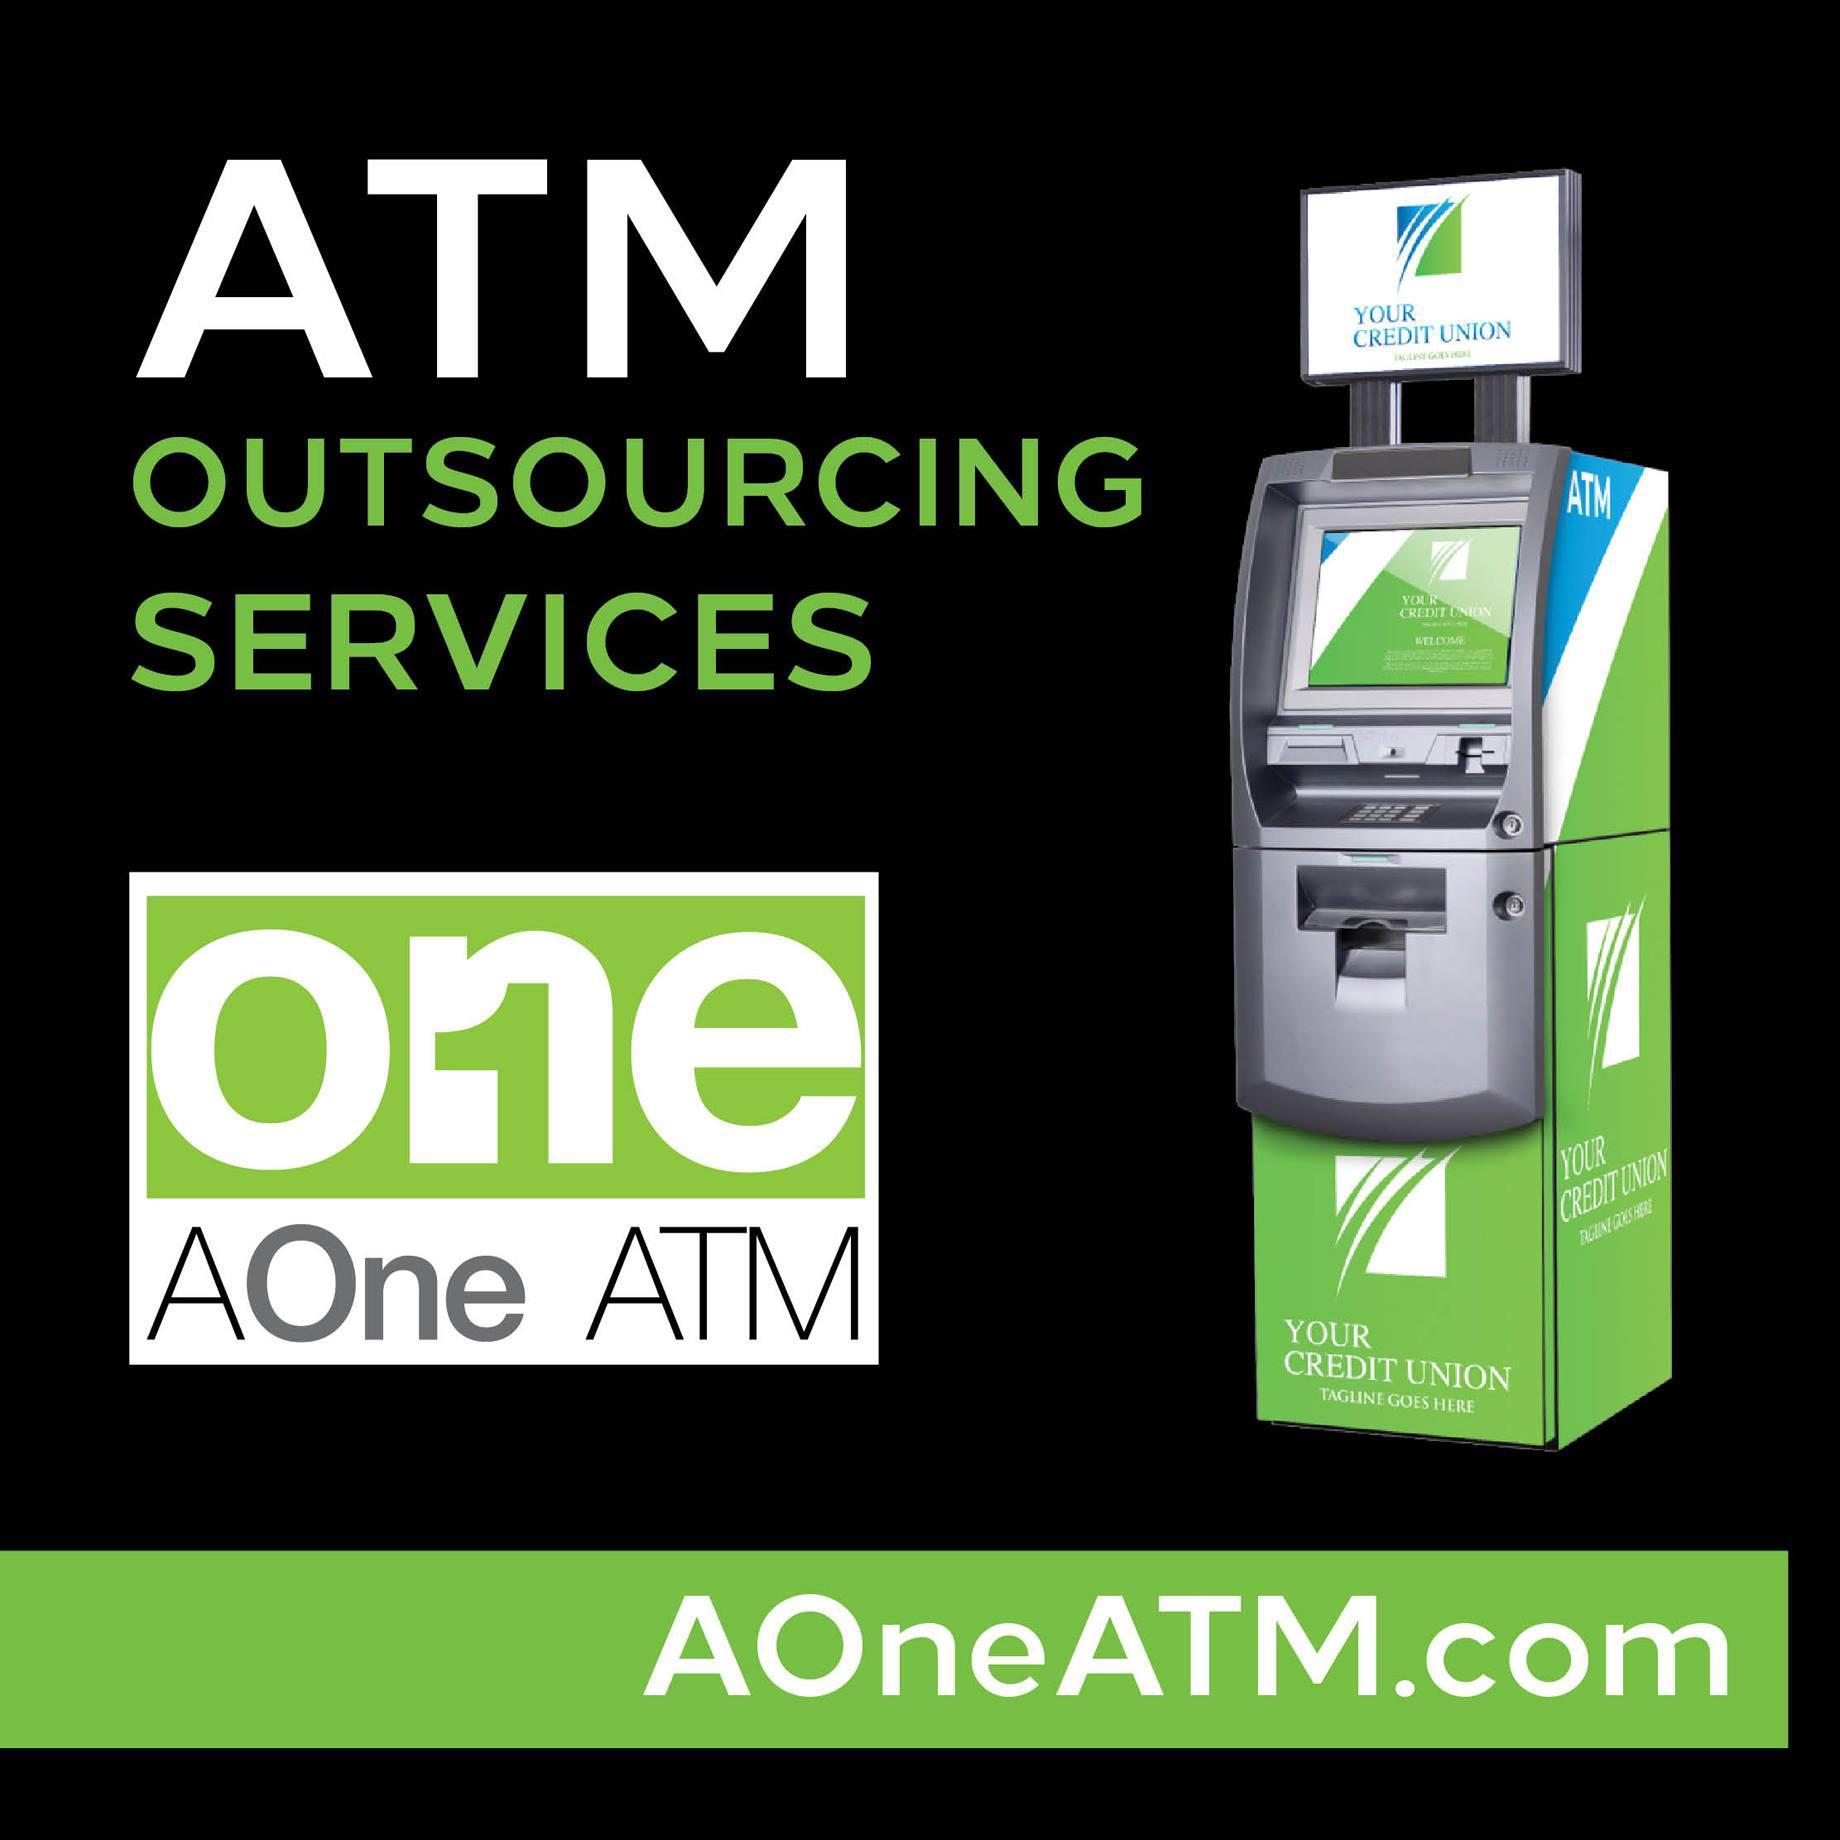 AOne ATM